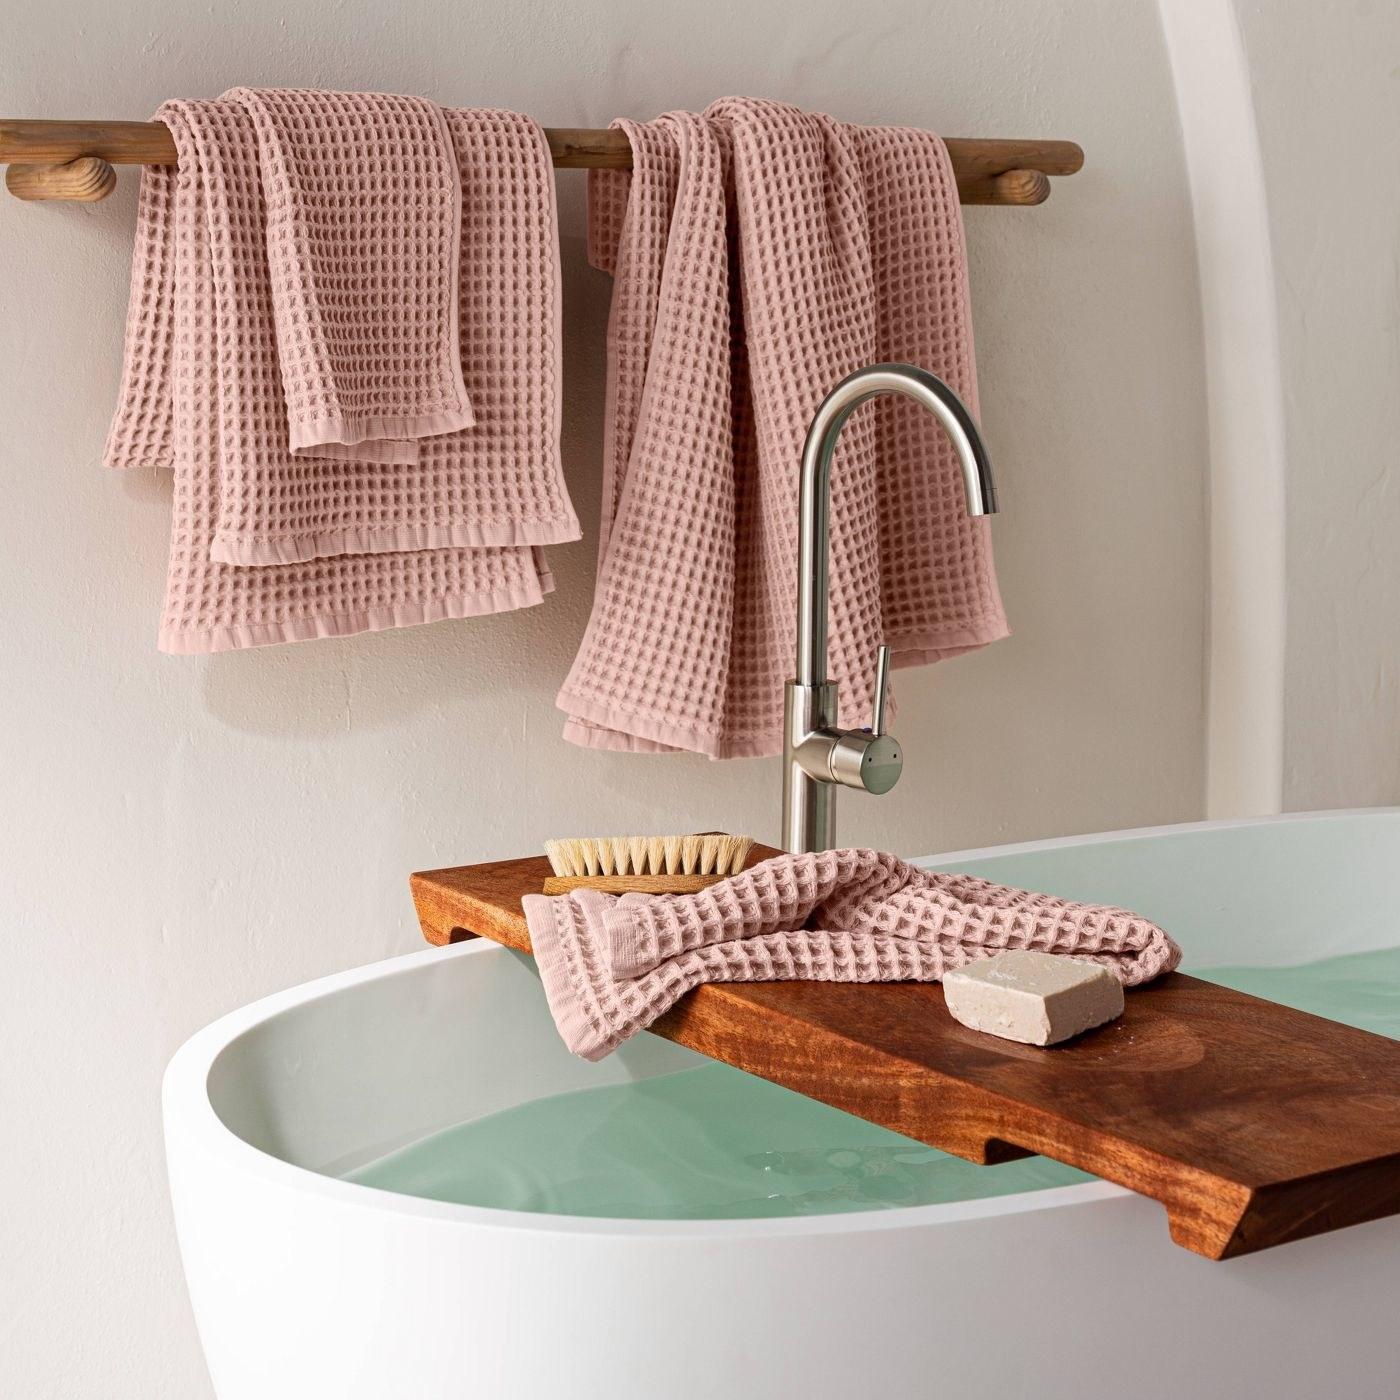 towels on bathtub